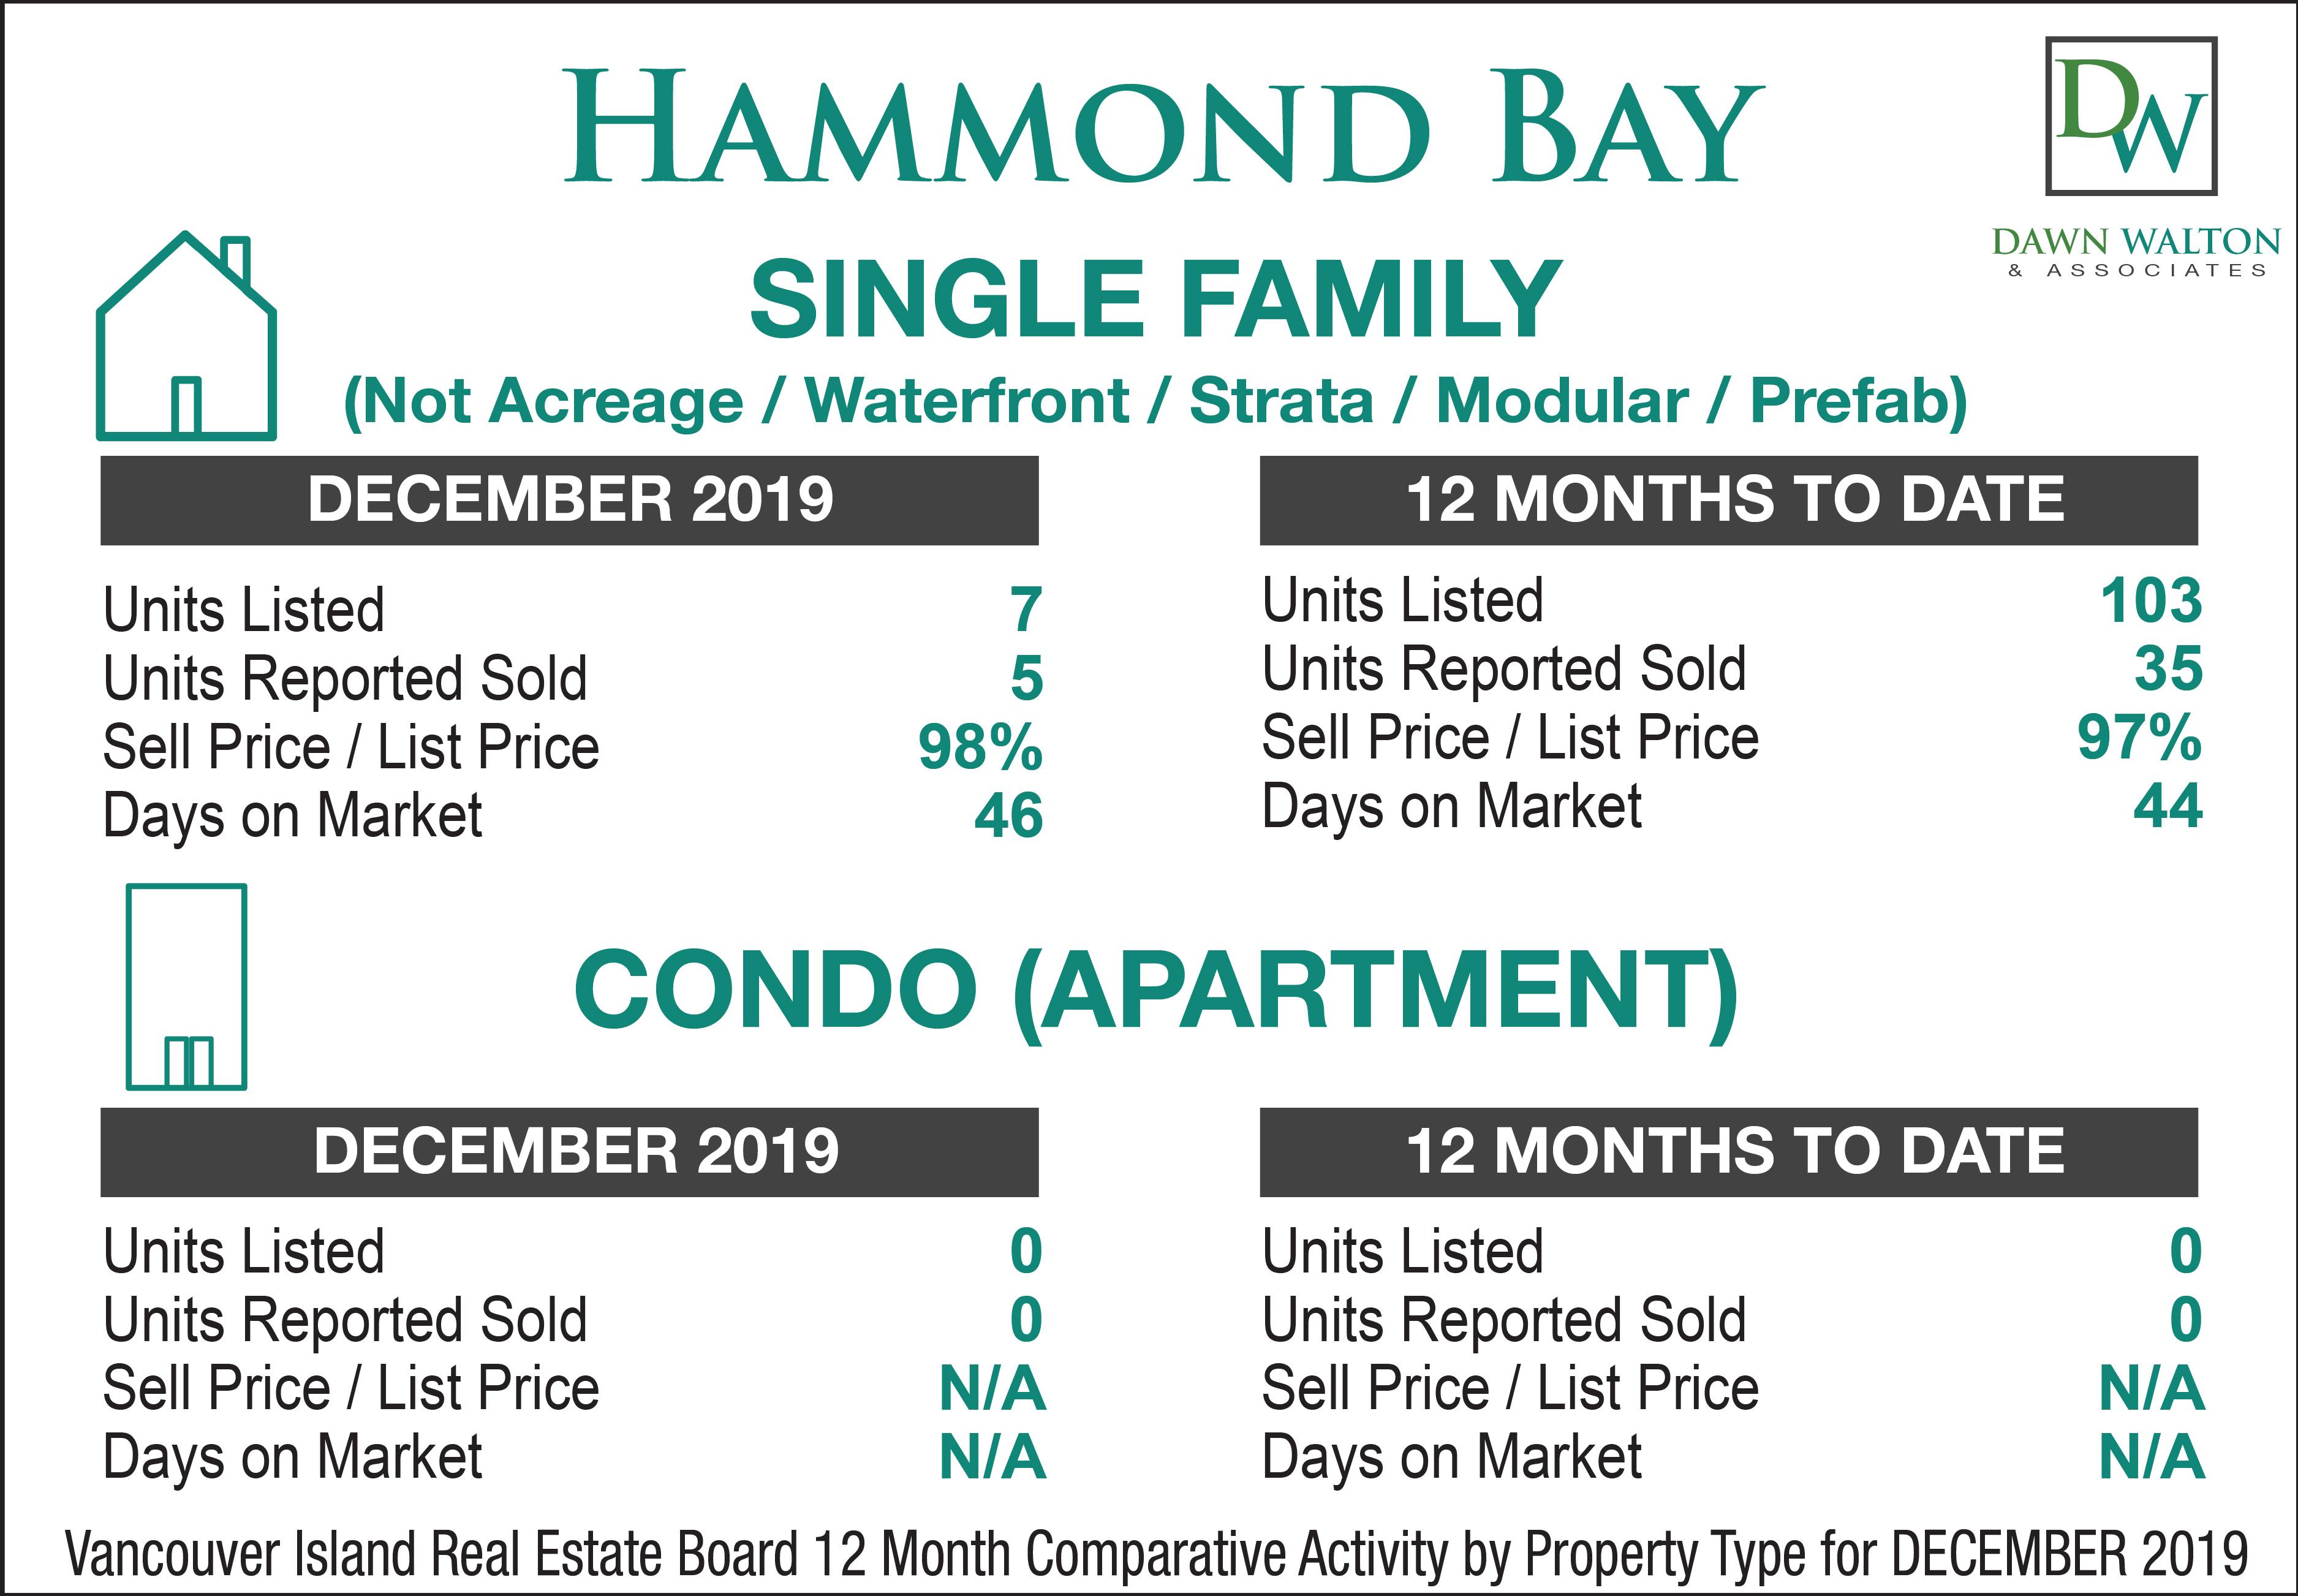 Hammond Bay Real Estate Market Stats December  2019 - Nanaimo Realtor Dawn Walton